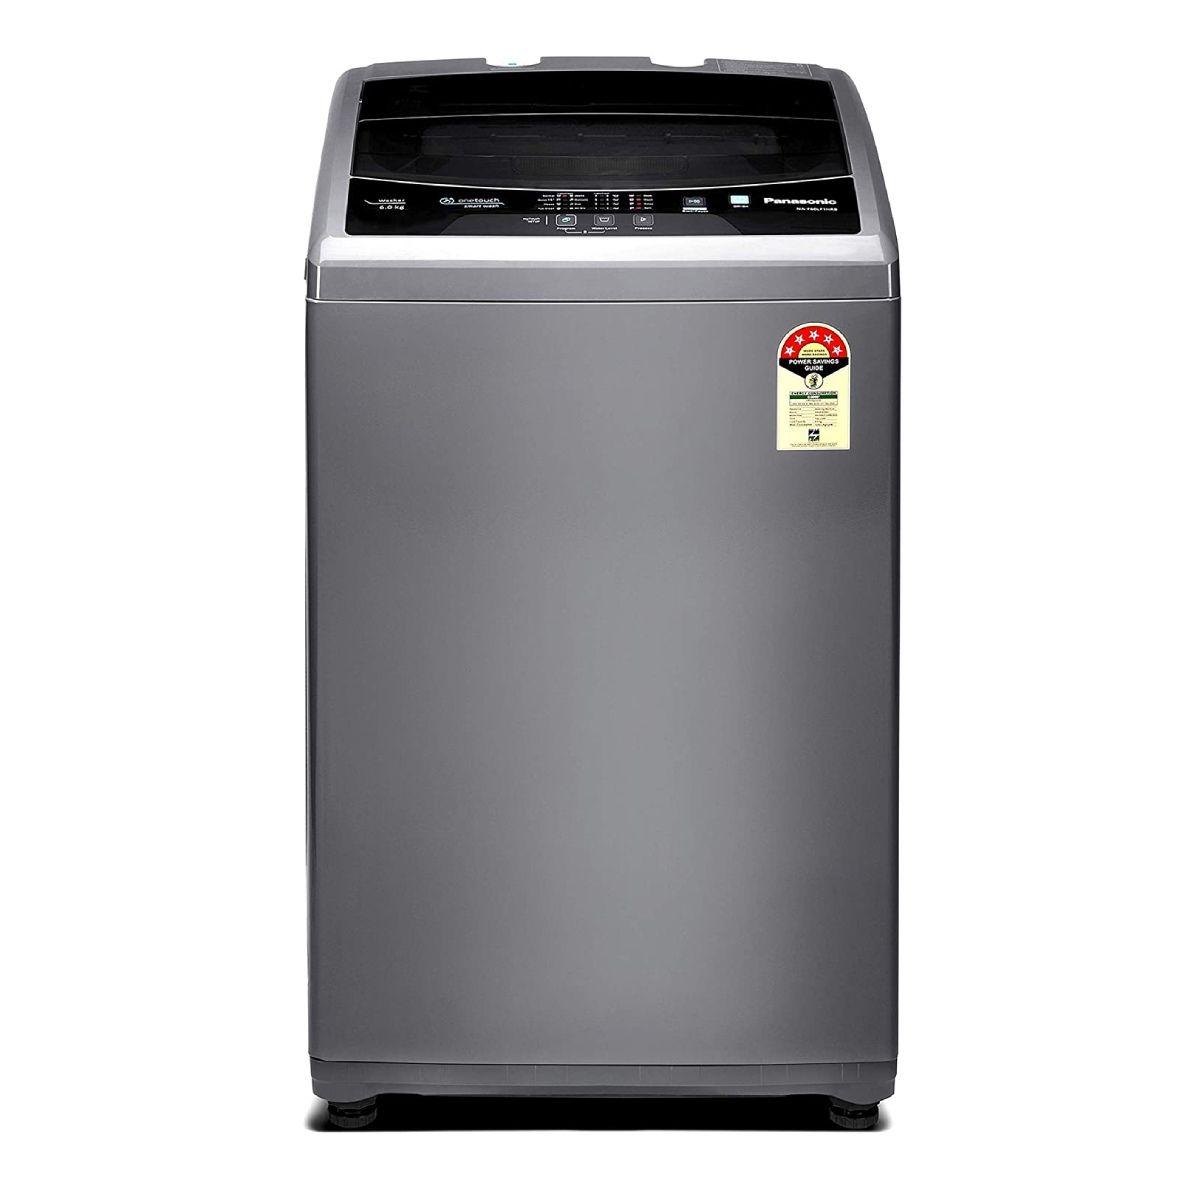 Panasonic 6 Kg 5 Star Fully-Automatic Top Loading Washing Machine (NA-F60LF1HRB)